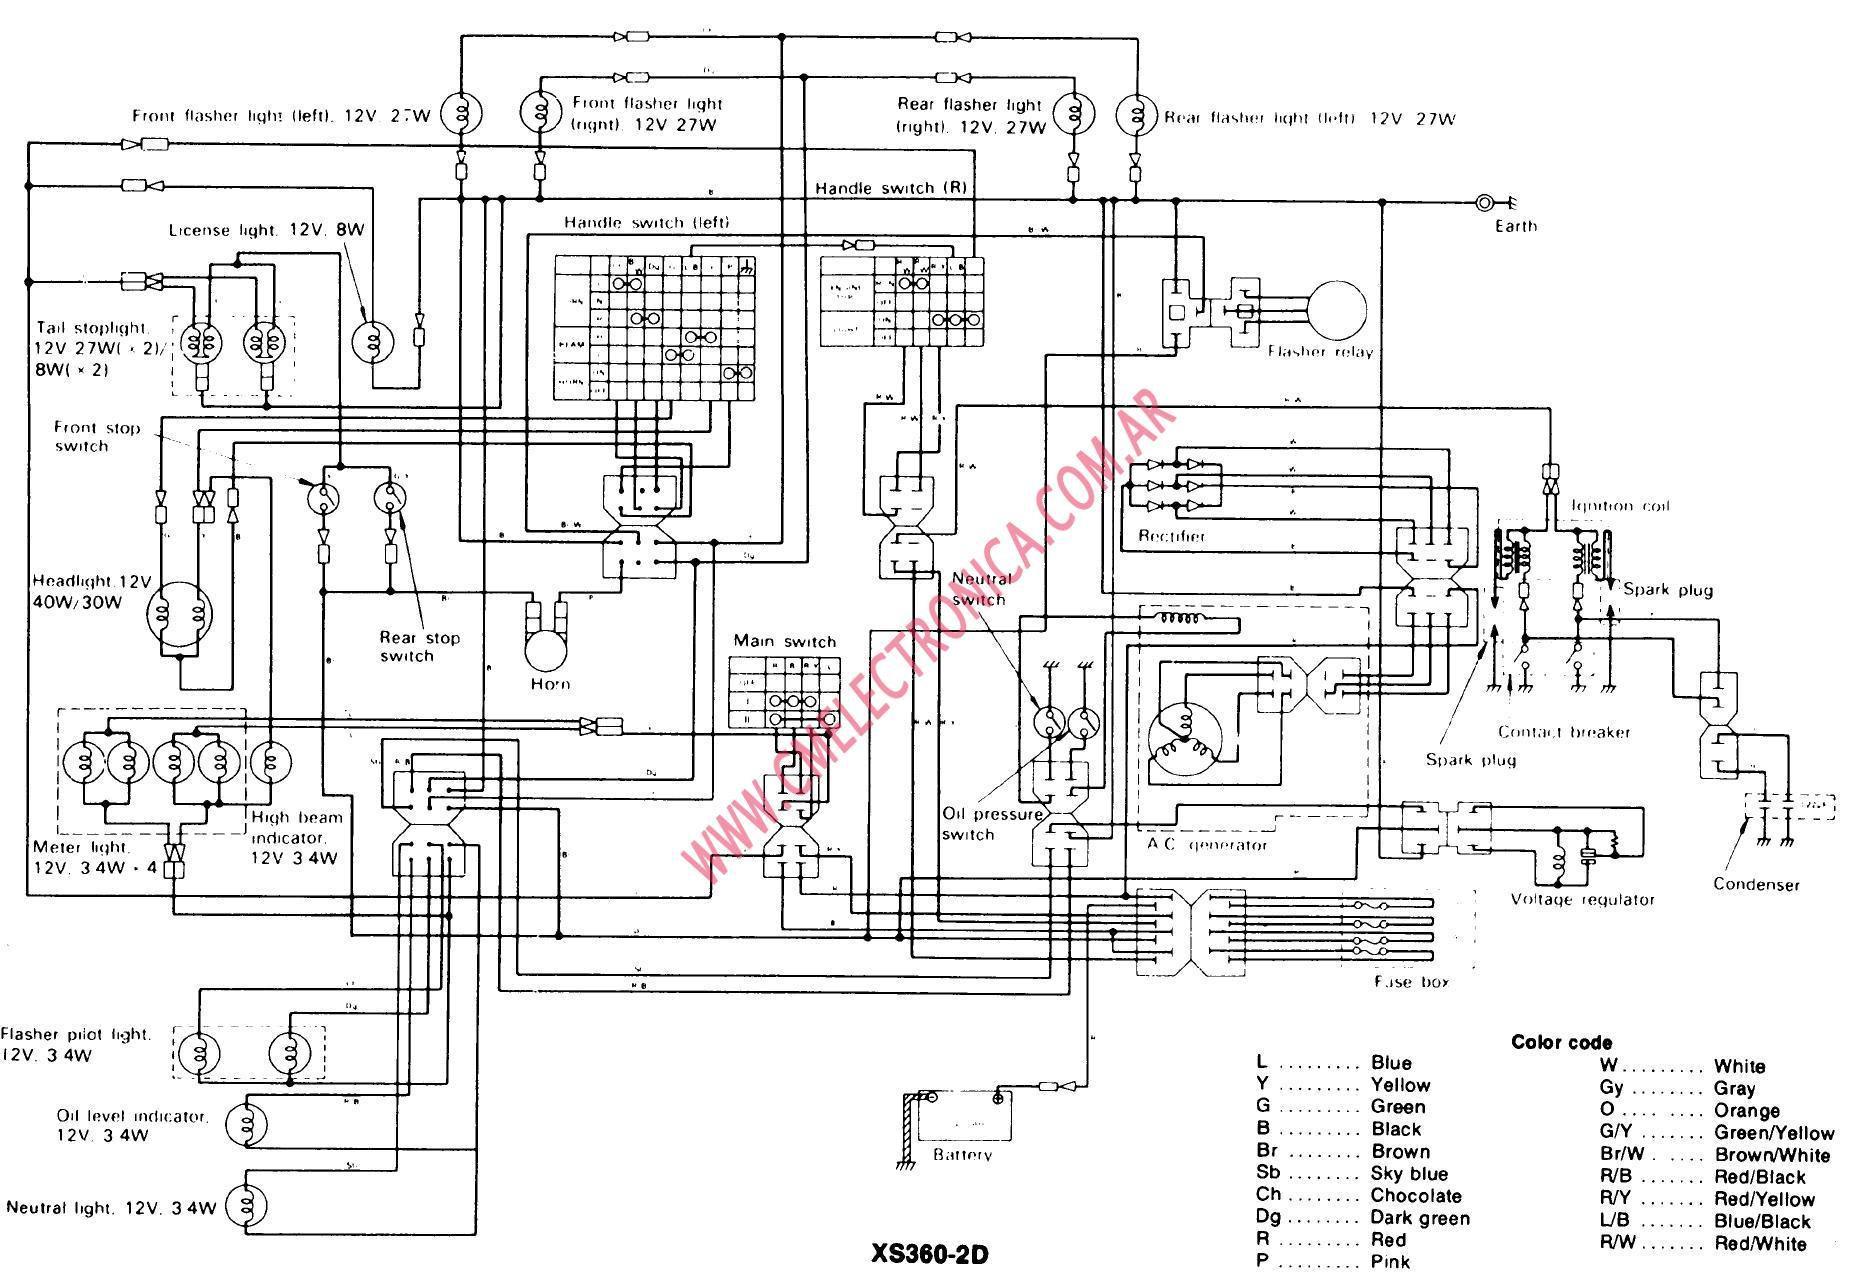 yamaha fz600 wiring diagram